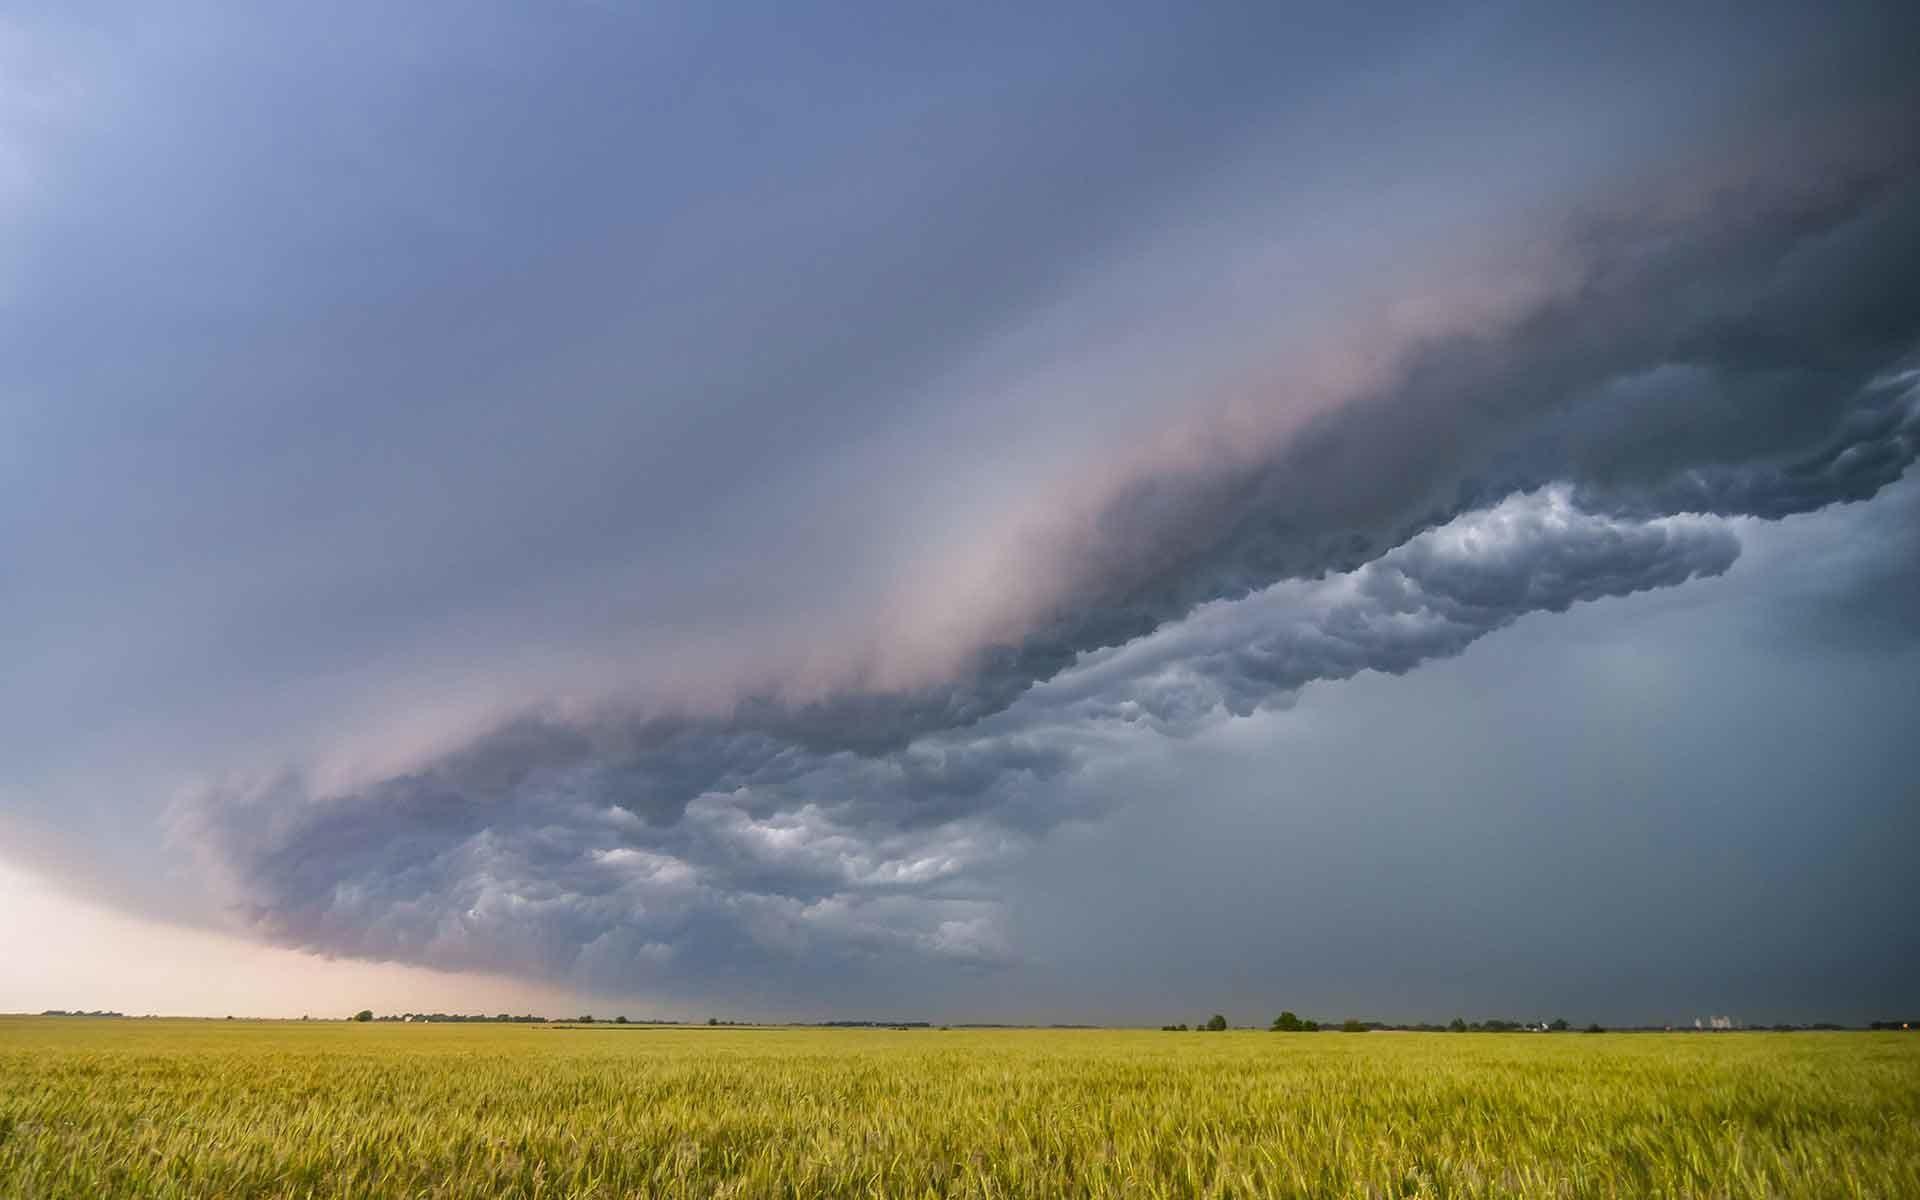 Sky Clouds Field Rain Storm Desktop Nature Wallpaper .